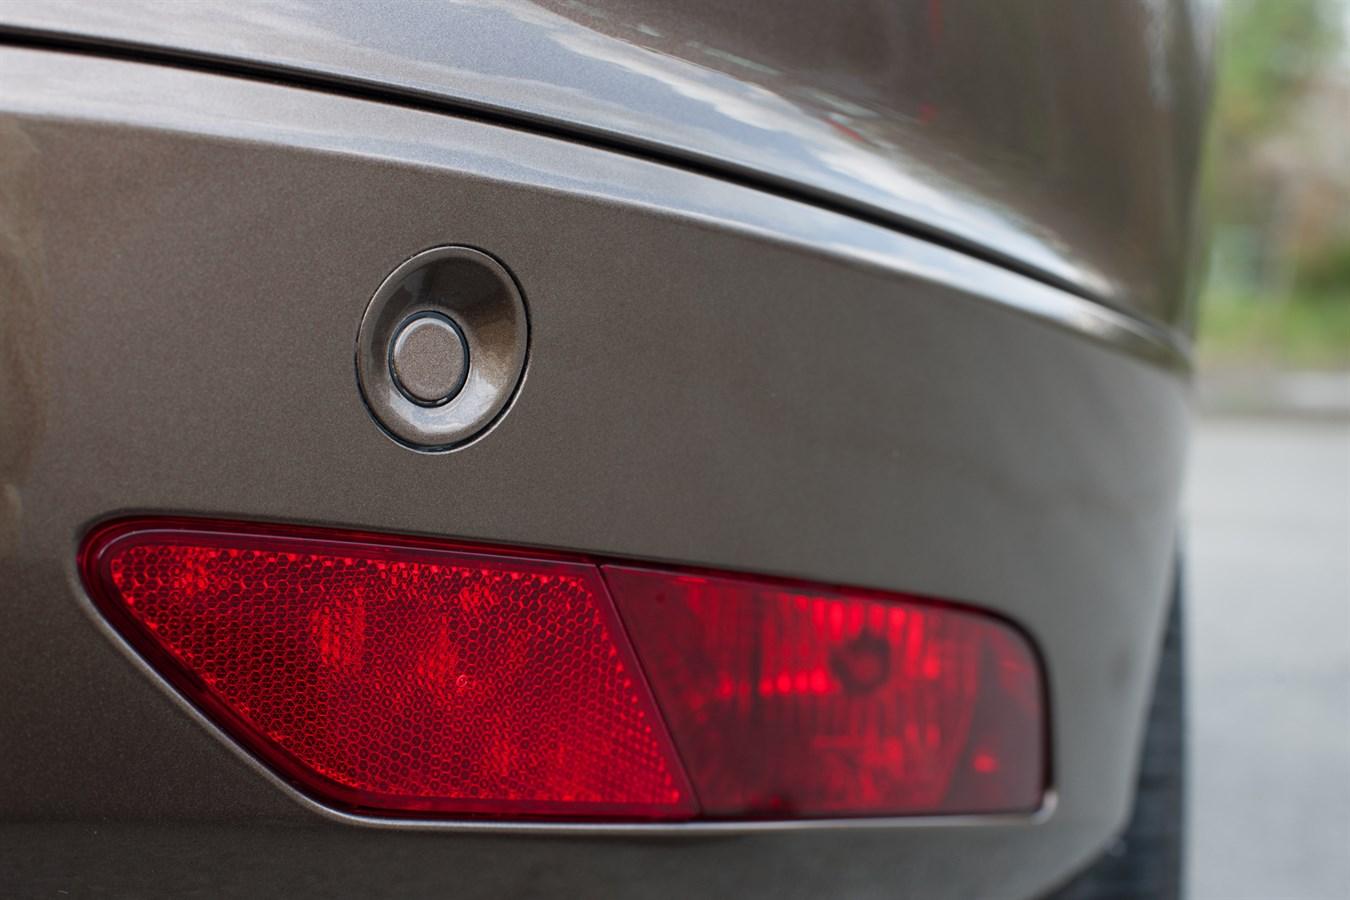 Volvo XC60 - Volvo Car Group Global Media Newsroom